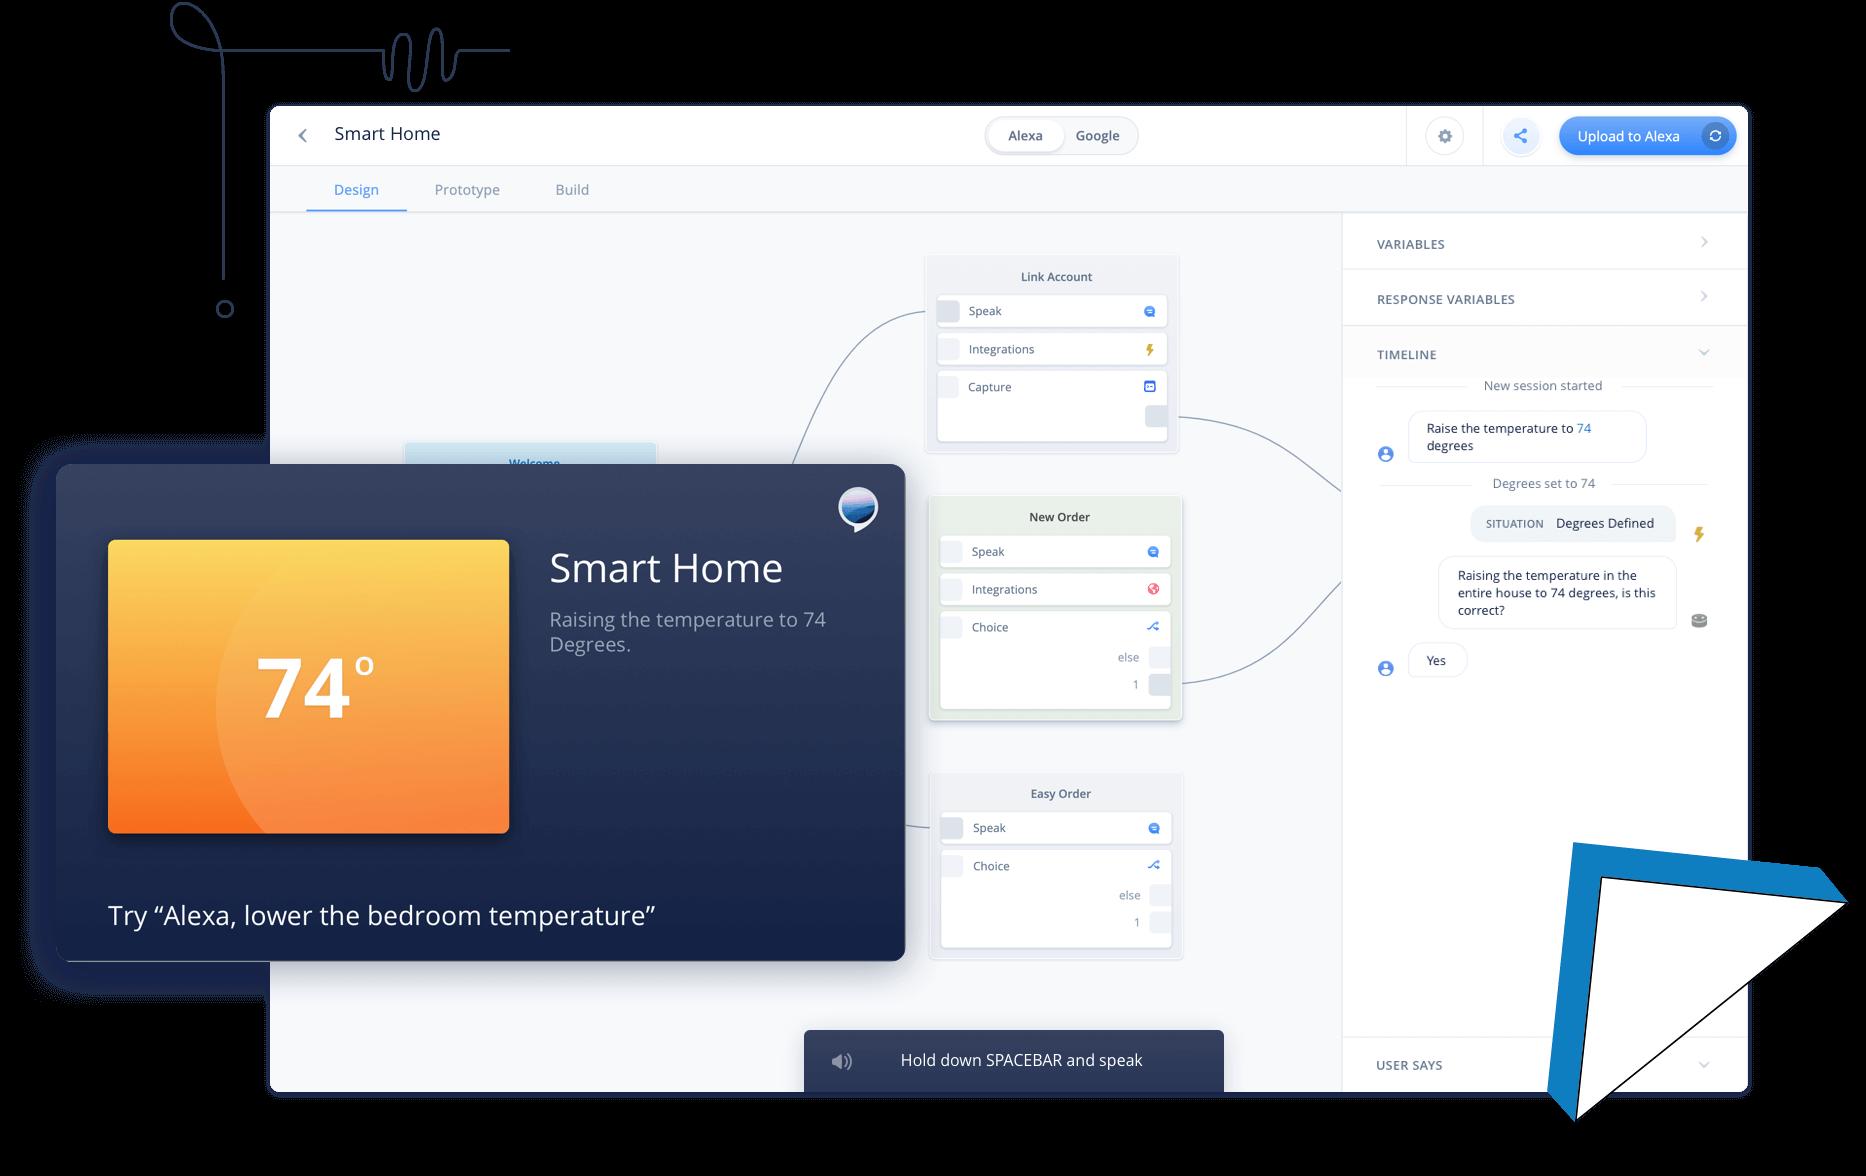 Voiceflow - Design, prototype, and build voice apps